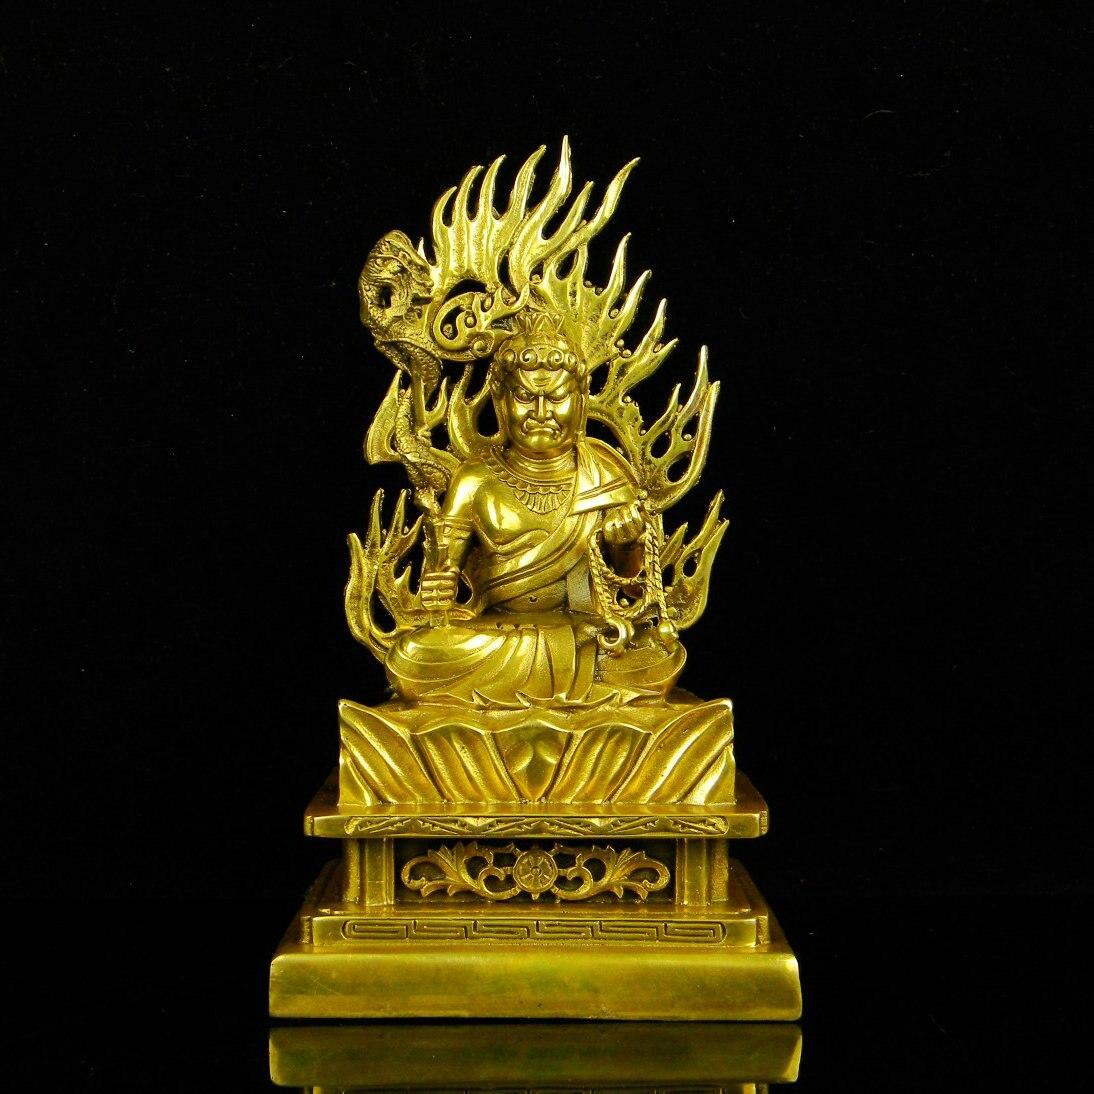 Laiton, Acala, Acalanatha, bouddha Bodhisattva, statue de bouddha, figure bouddhiste, figurine bouddhiste, saint Patron environ 21 cmLaiton, Acala, Acalanatha, bouddha Bodhisattva, statue de bouddha, figure bouddhiste, figurine bouddhiste, saint Patron environ 21 cm